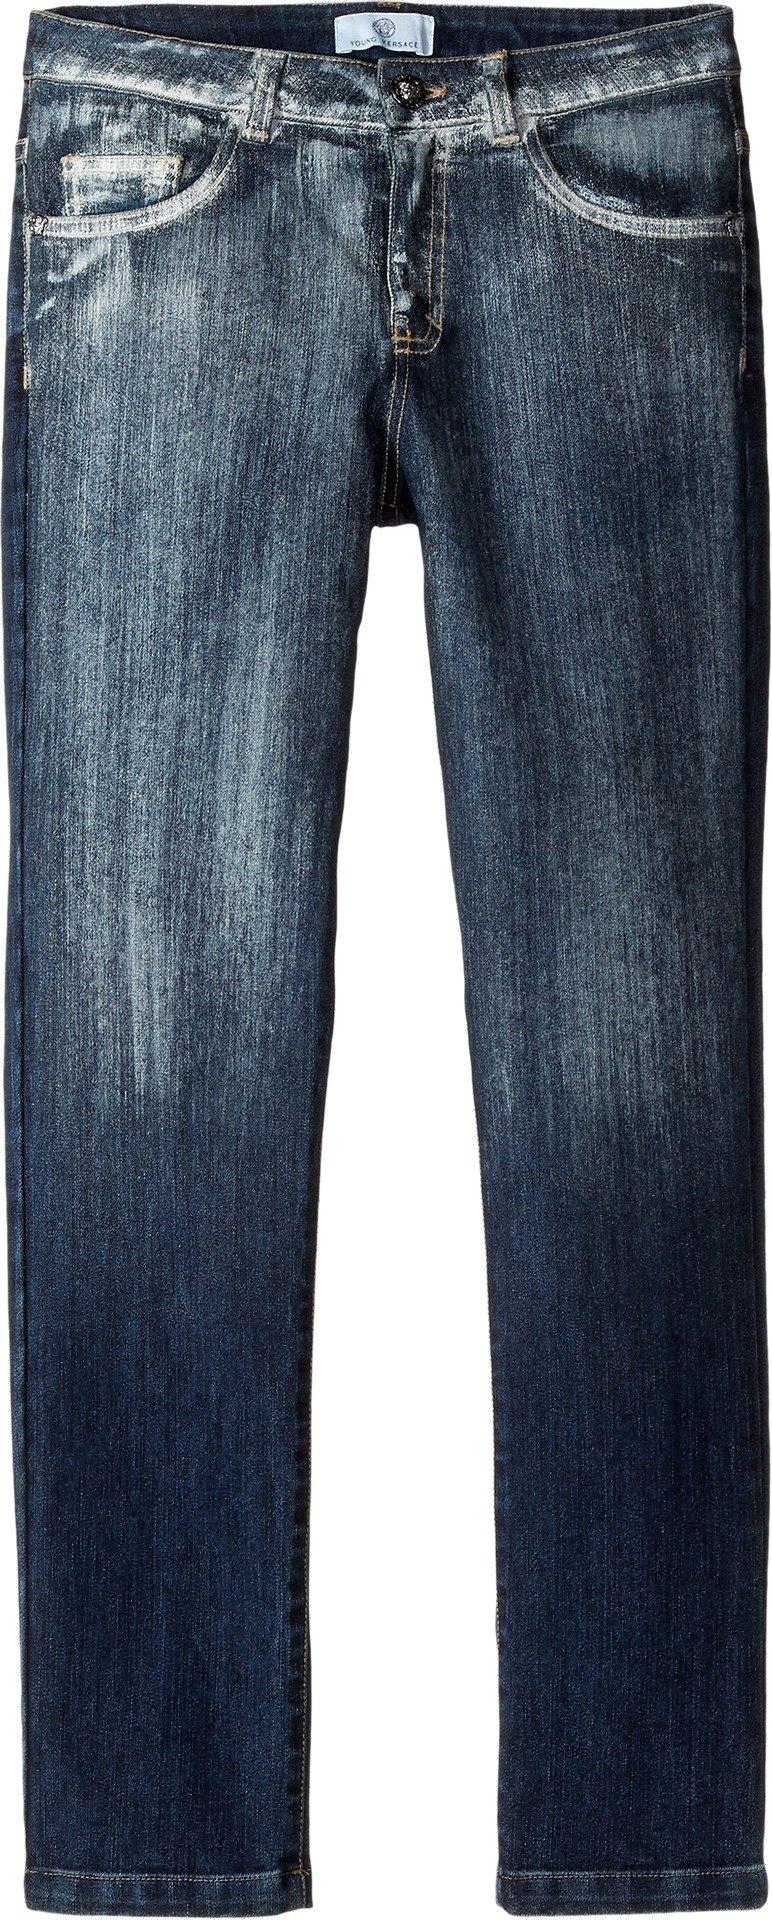 Versace Kids  Boy's Faded Denim Pants (Big Kids) Denim Jeans by Versace